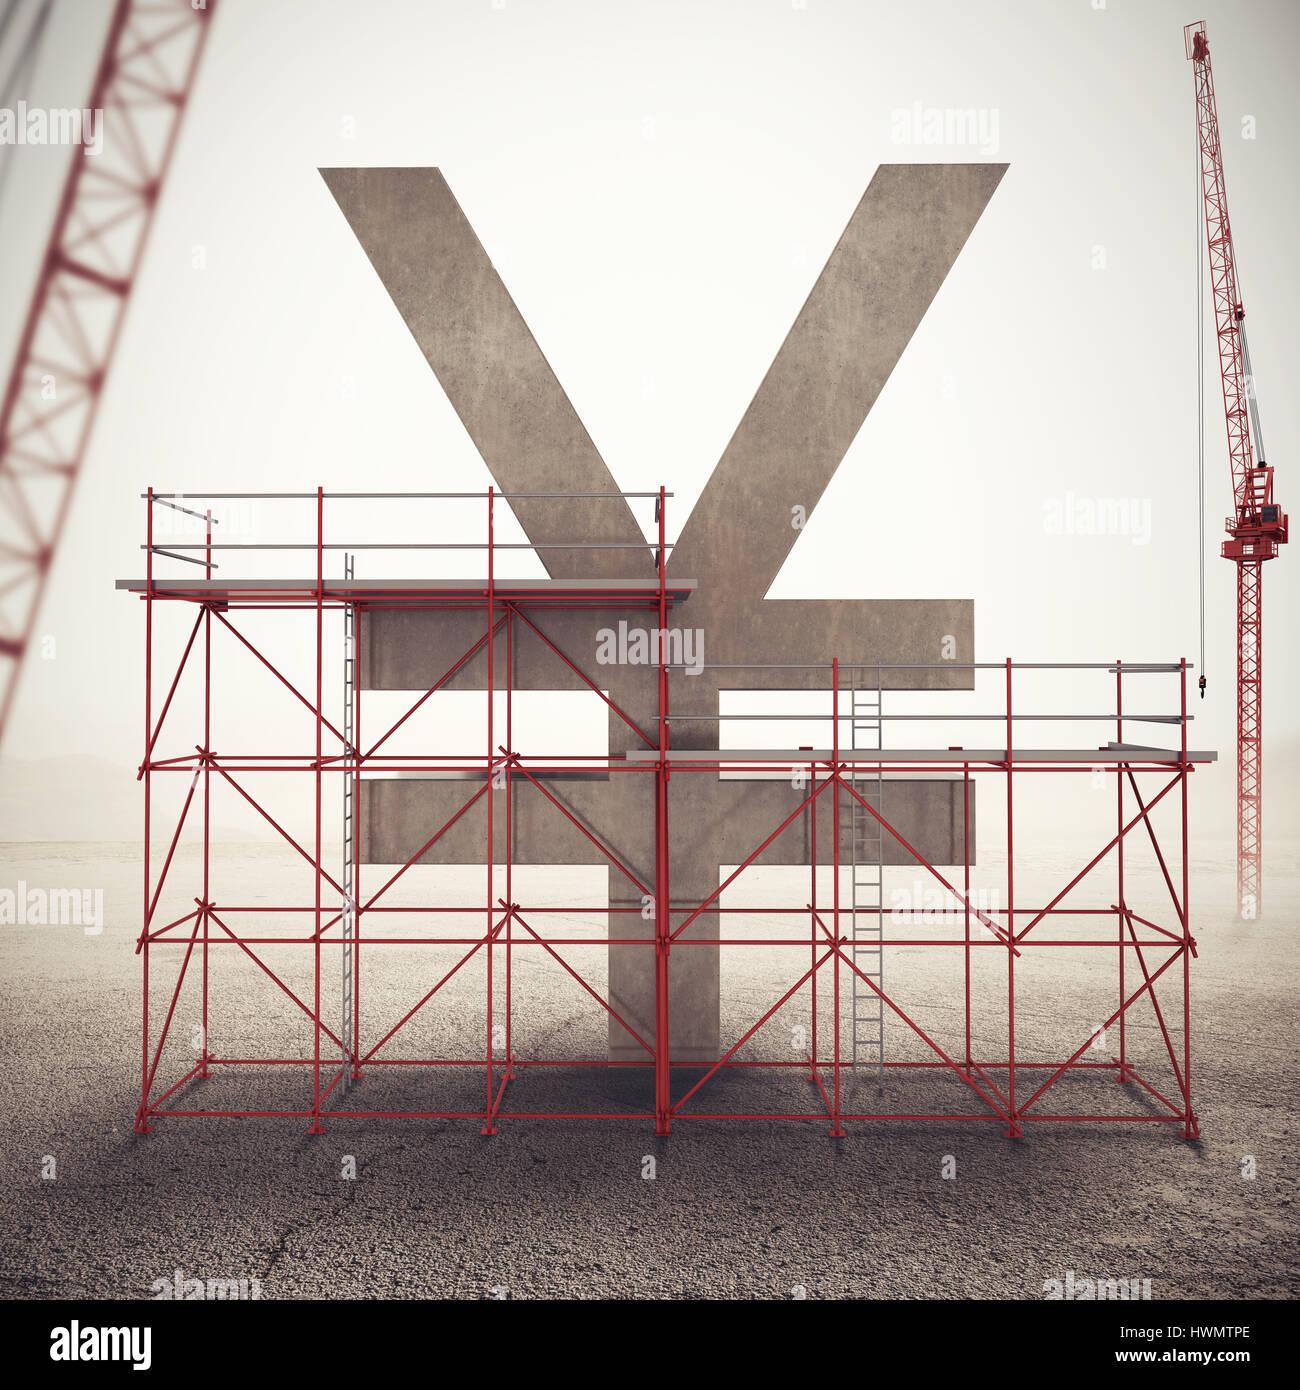 Strengthen yen economy . 3D Rendering - Stock Image